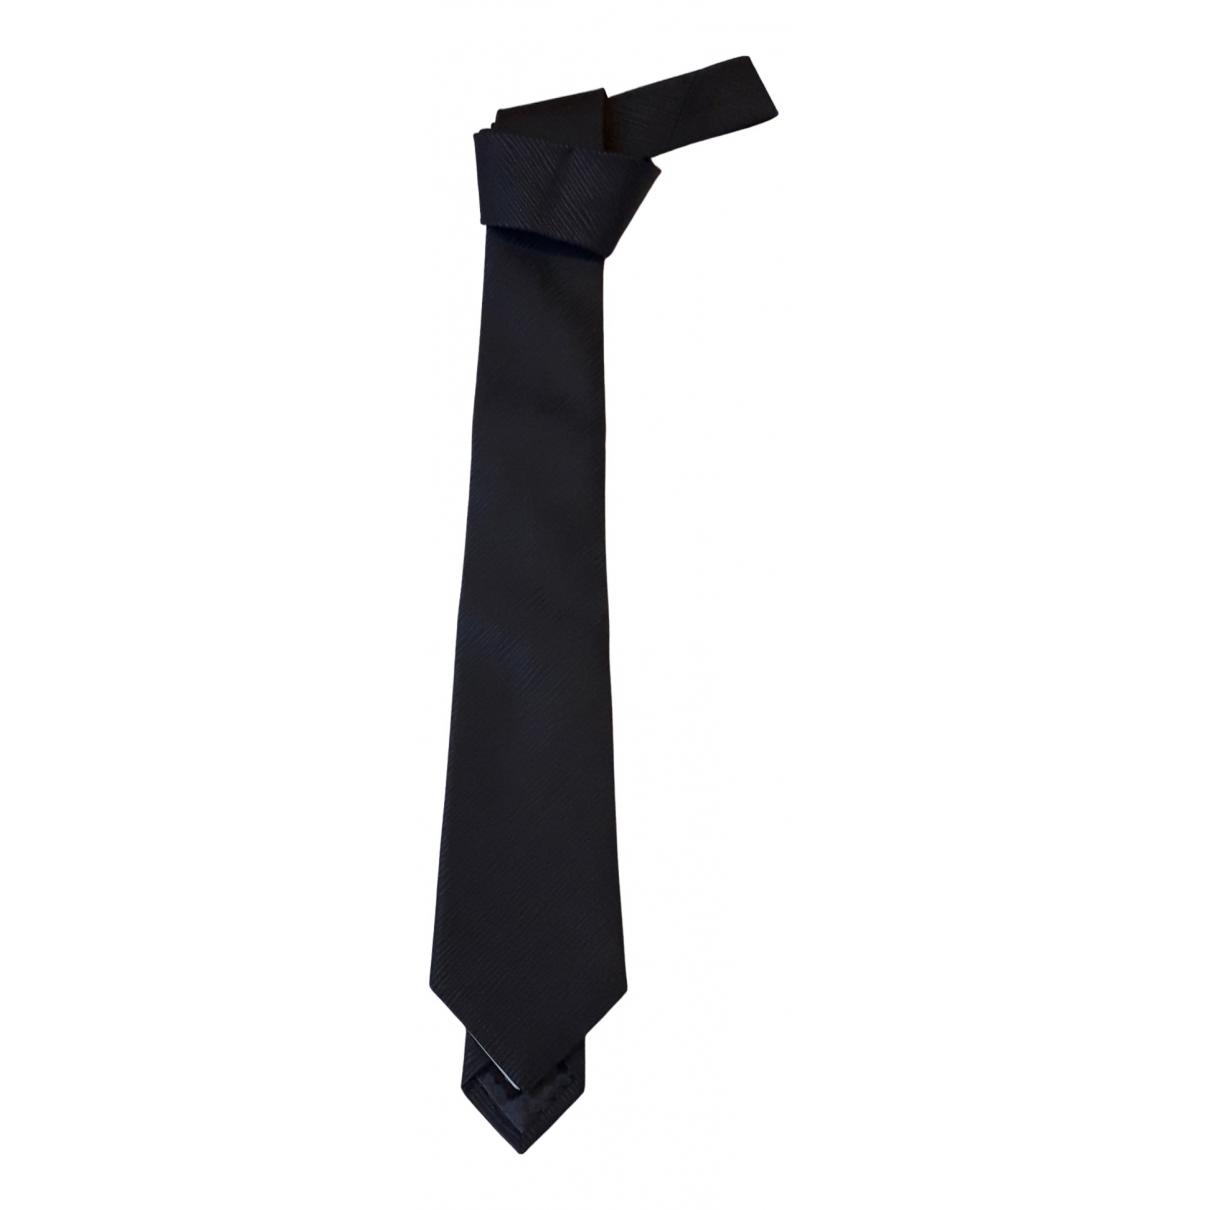 Louis Vuitton N Anthracite Silk Ties for Men N